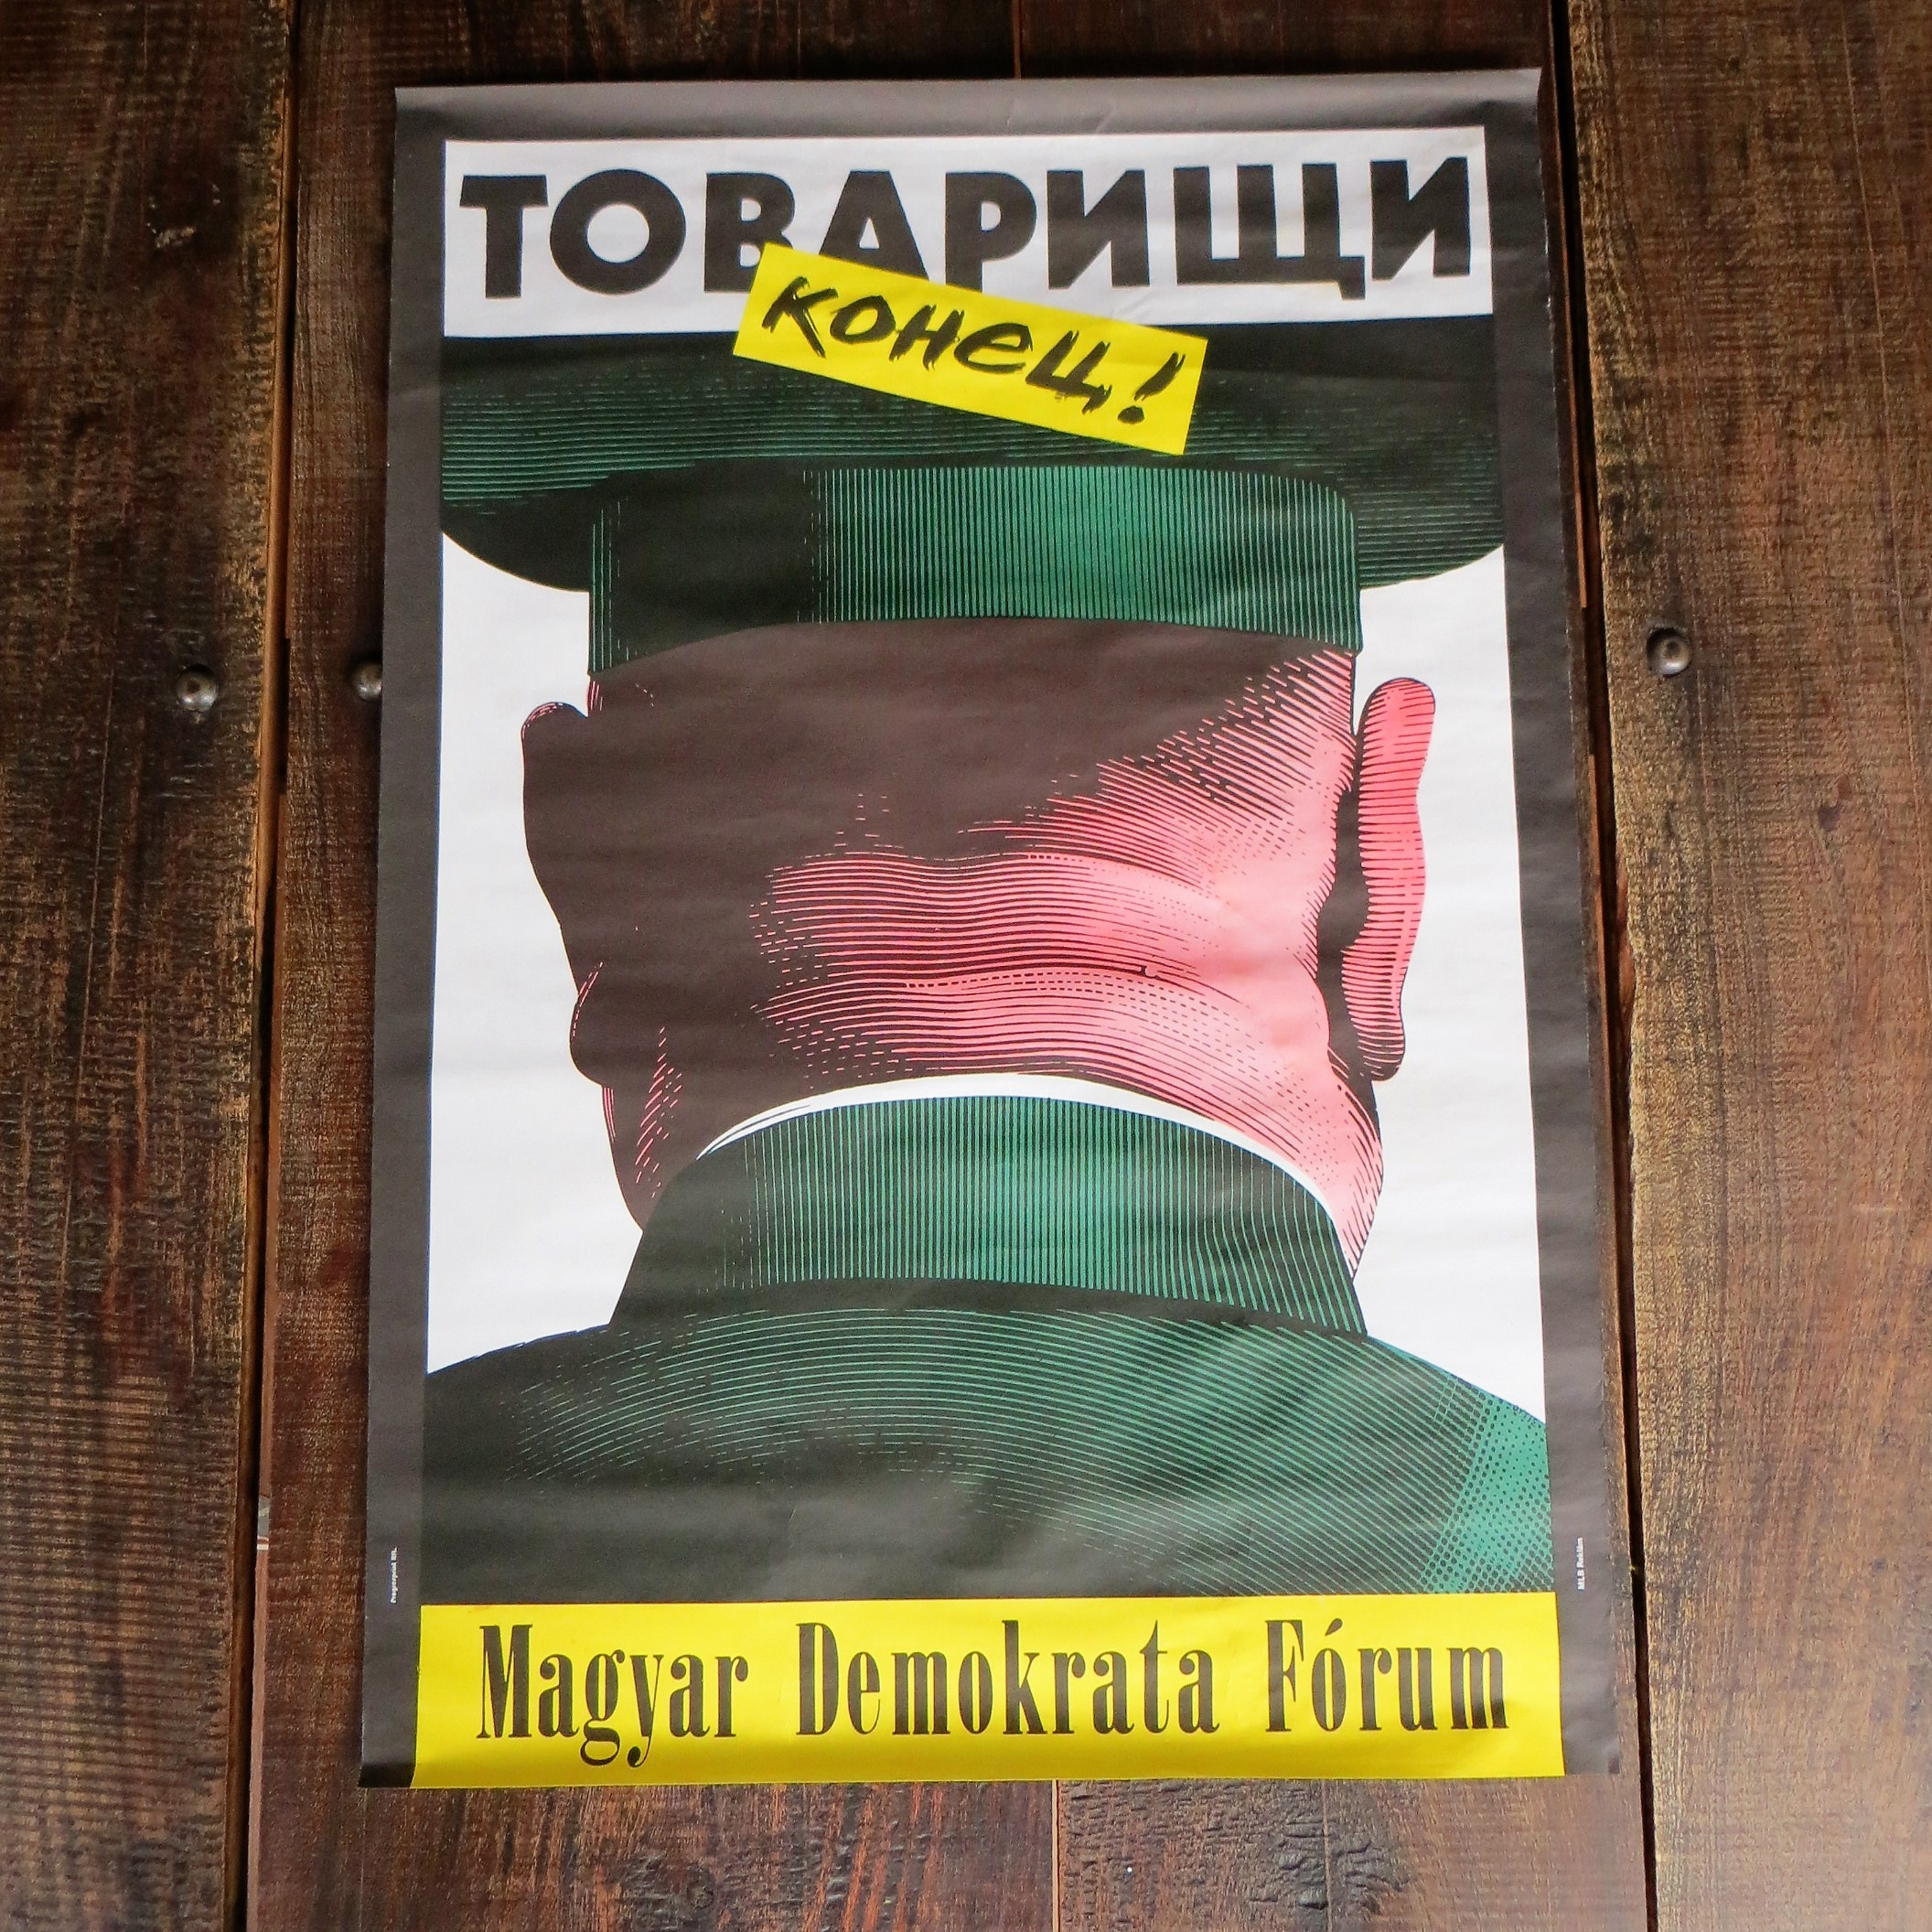 Propagandaworld (297)